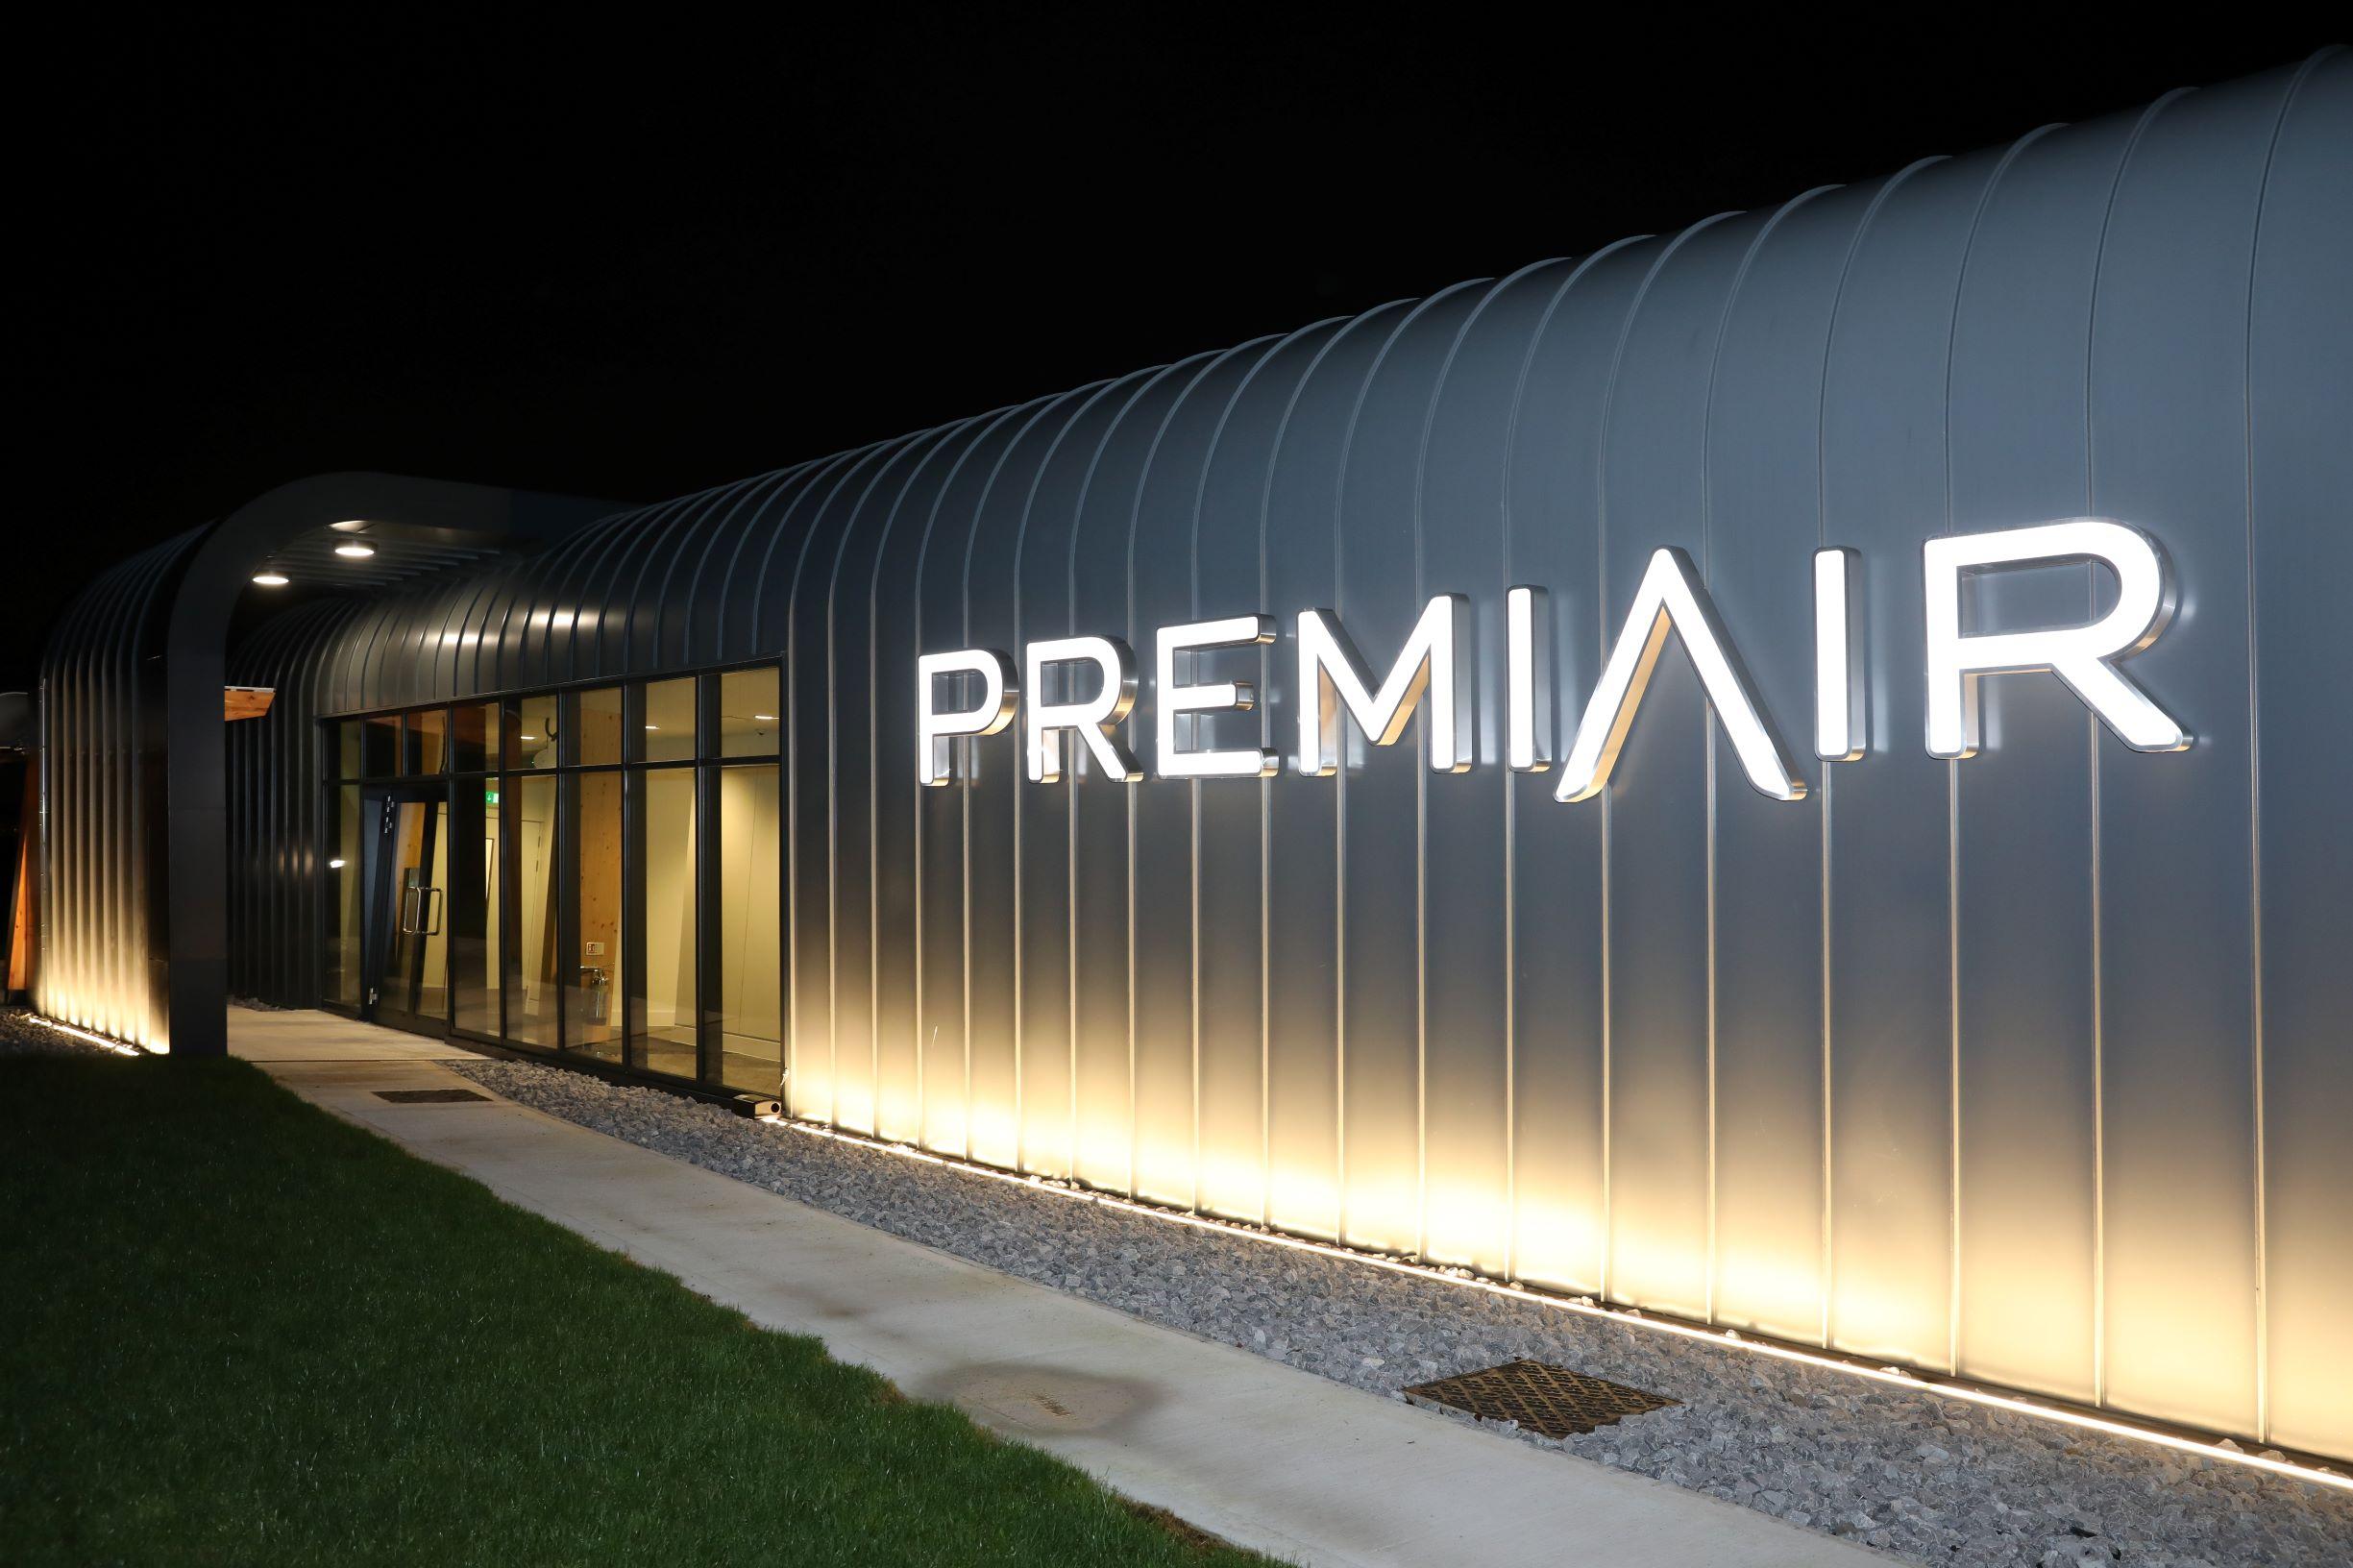 Manchester airport's PremiAir terminal